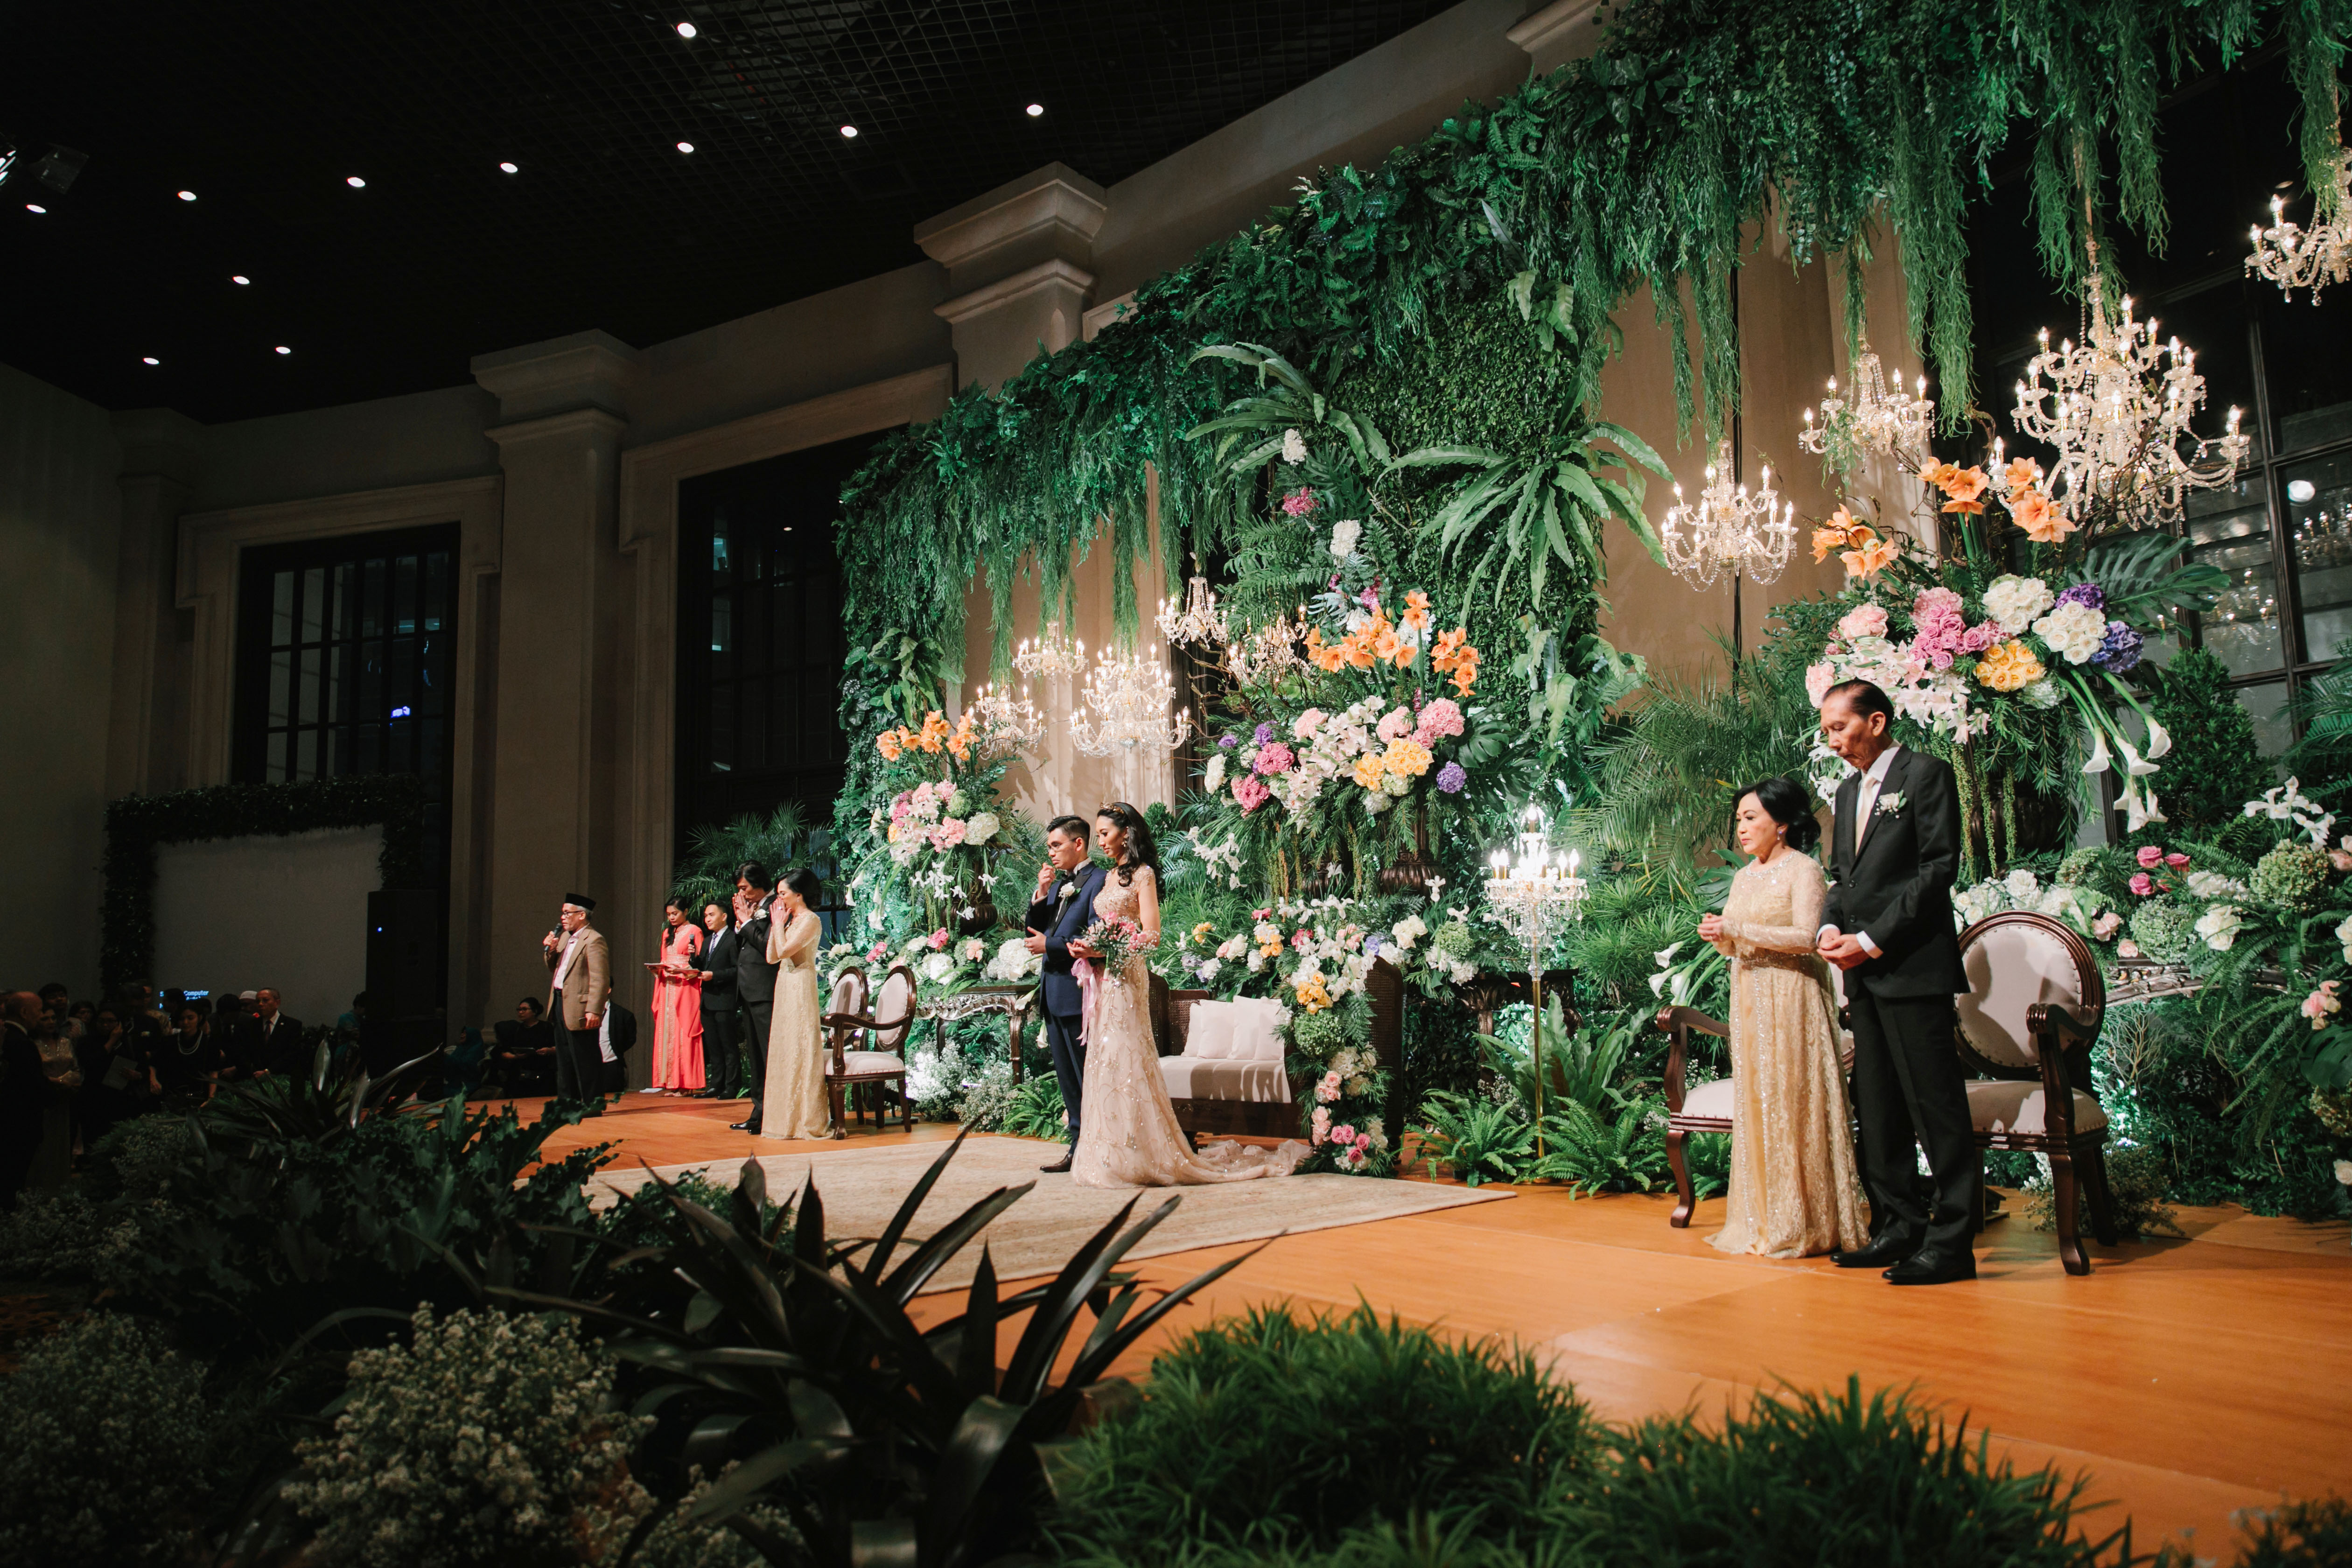 wedding reception stage enchanted forest garden decor